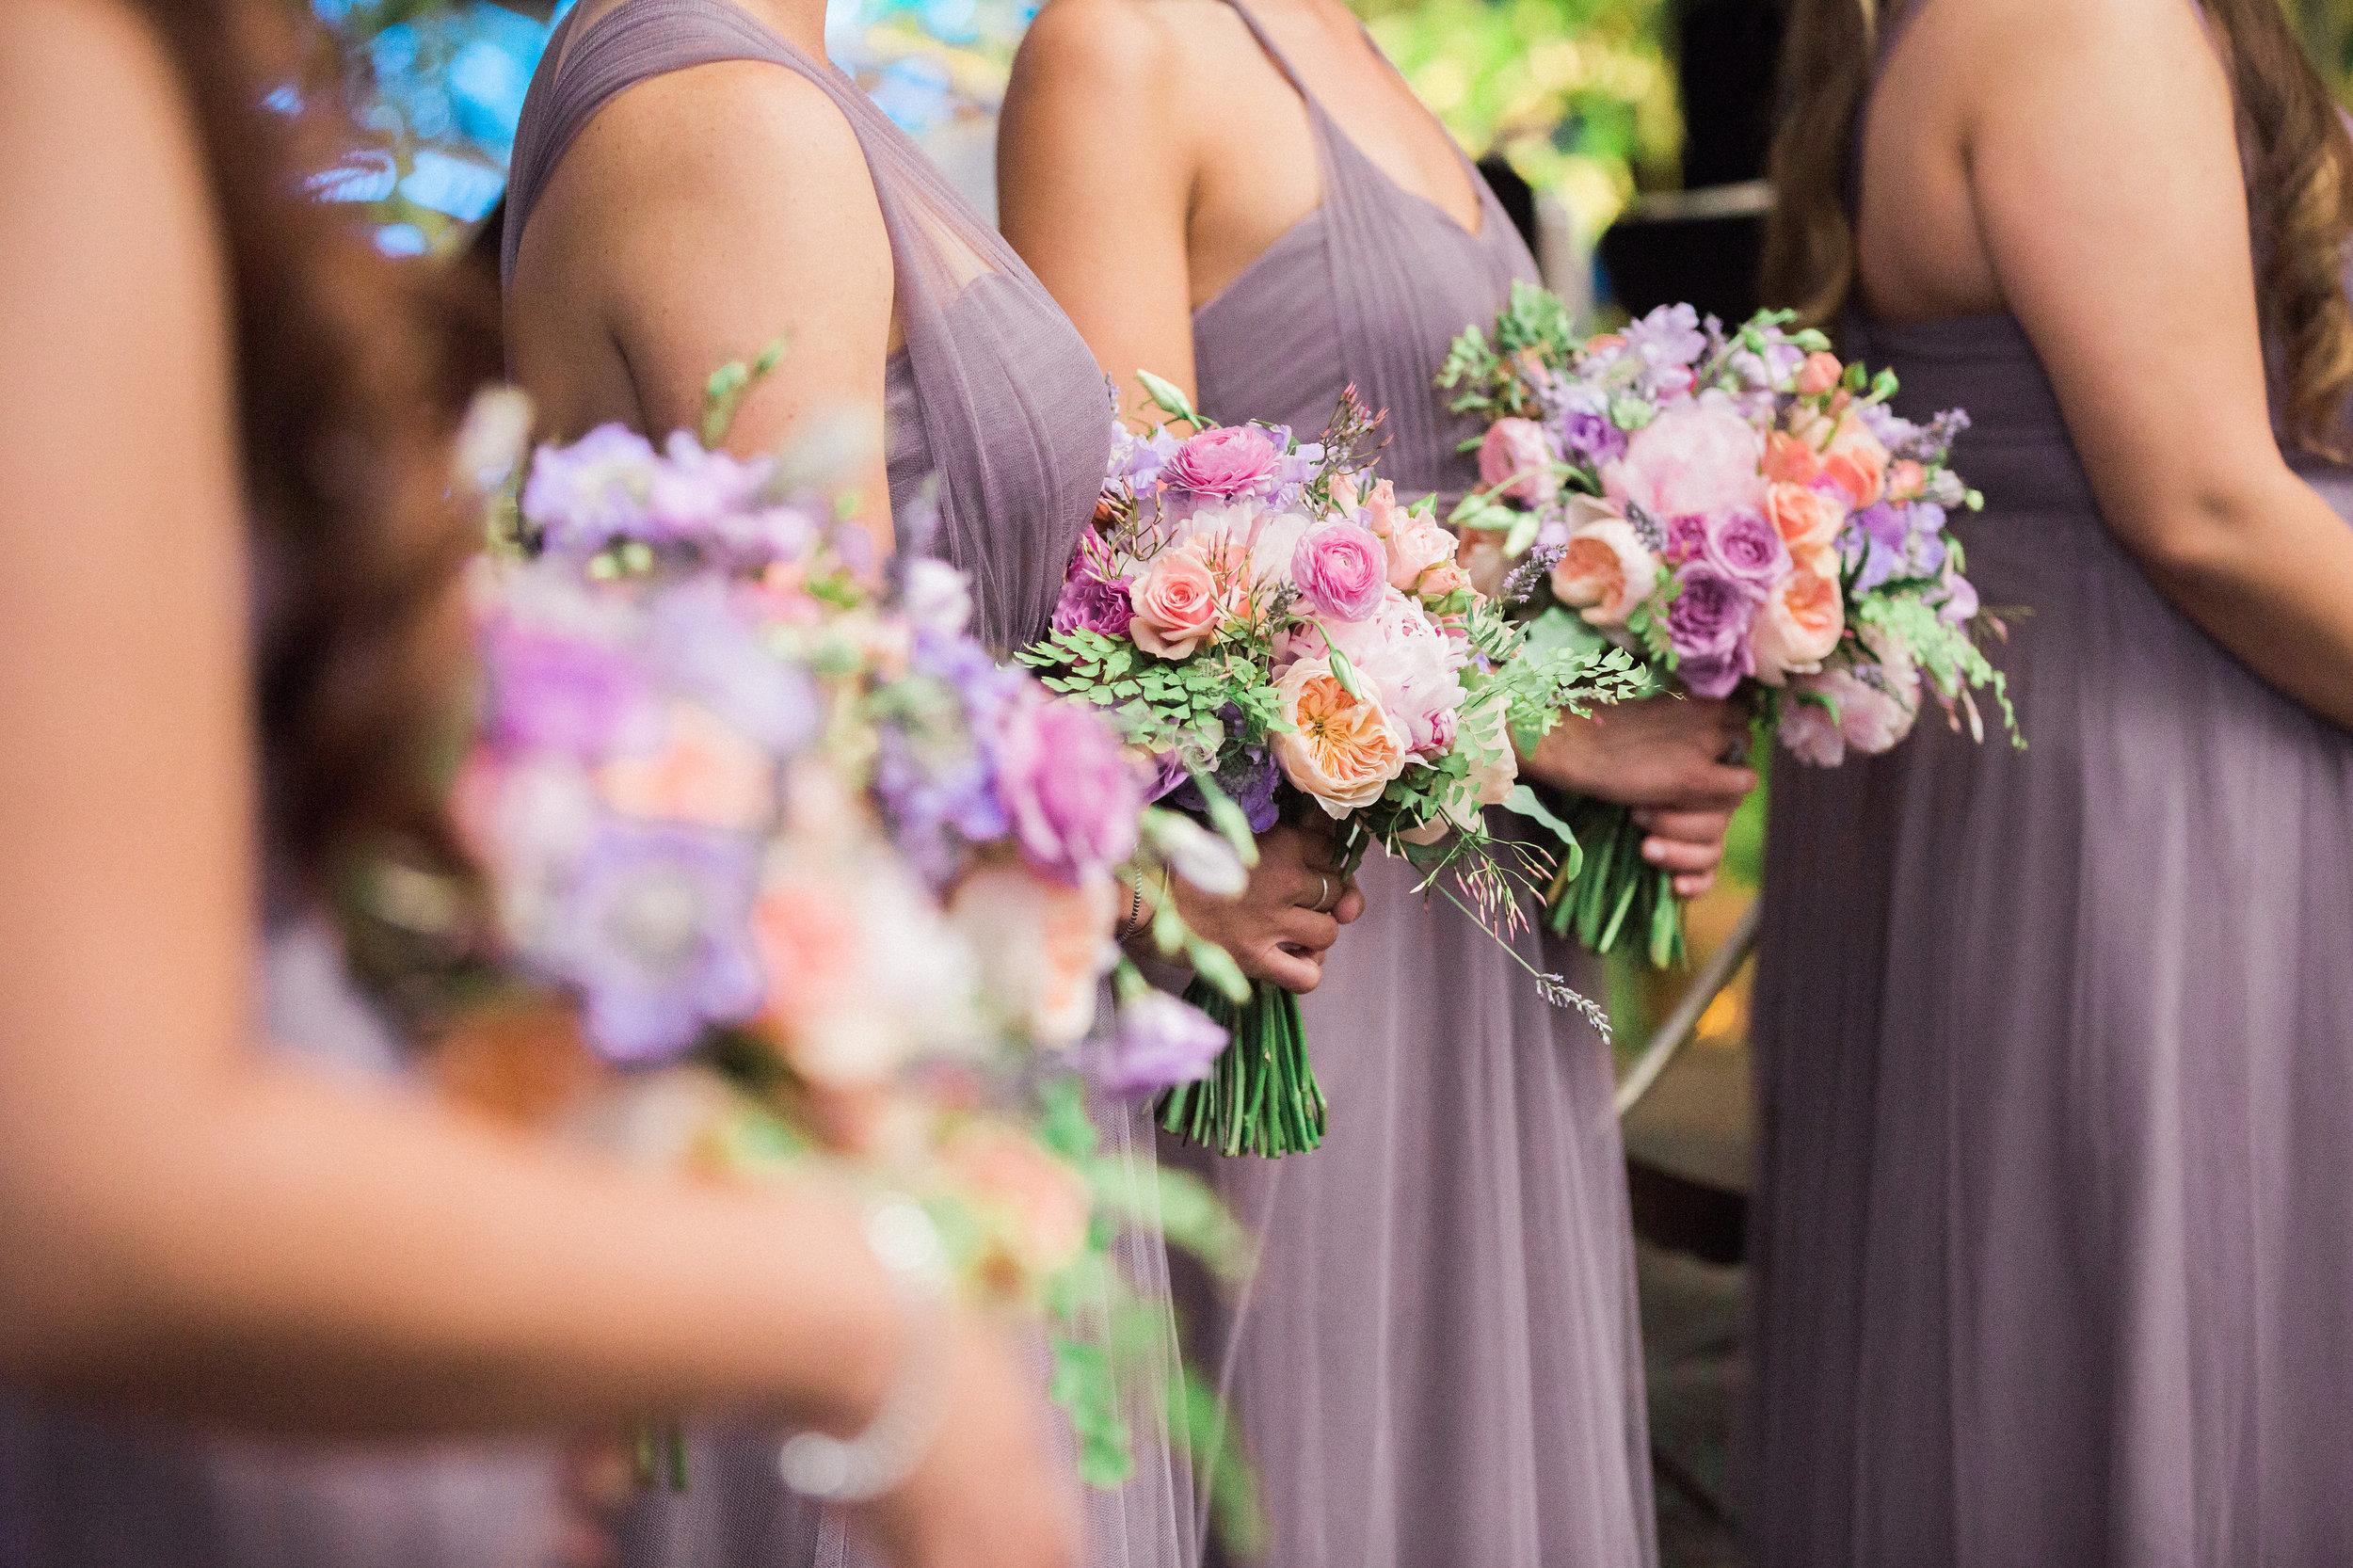 Bridesmaids Bouquet at The Hilton Netherland Plaza Hotel Cincinnati, OH